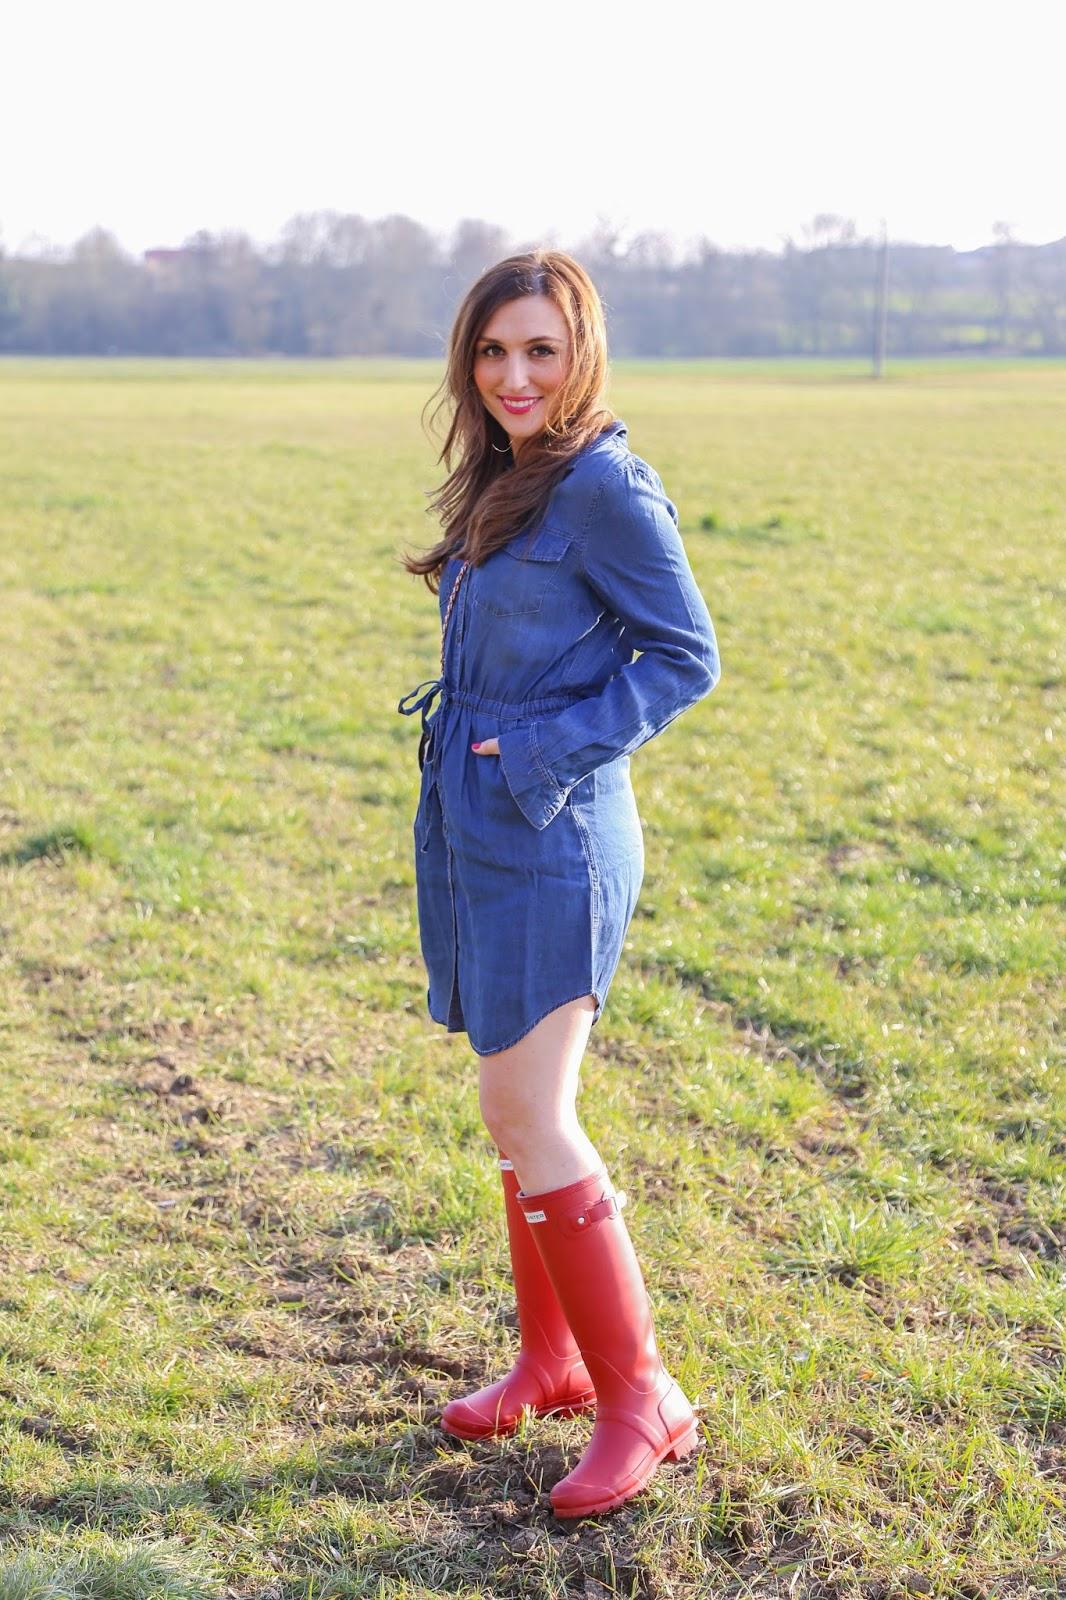 Fashionblogger aus Deutschlang - German Fashionblogger - Fashionblog - Outfitinspiration - Hunter Gummiestiefel - Fashinstylebyjohanna